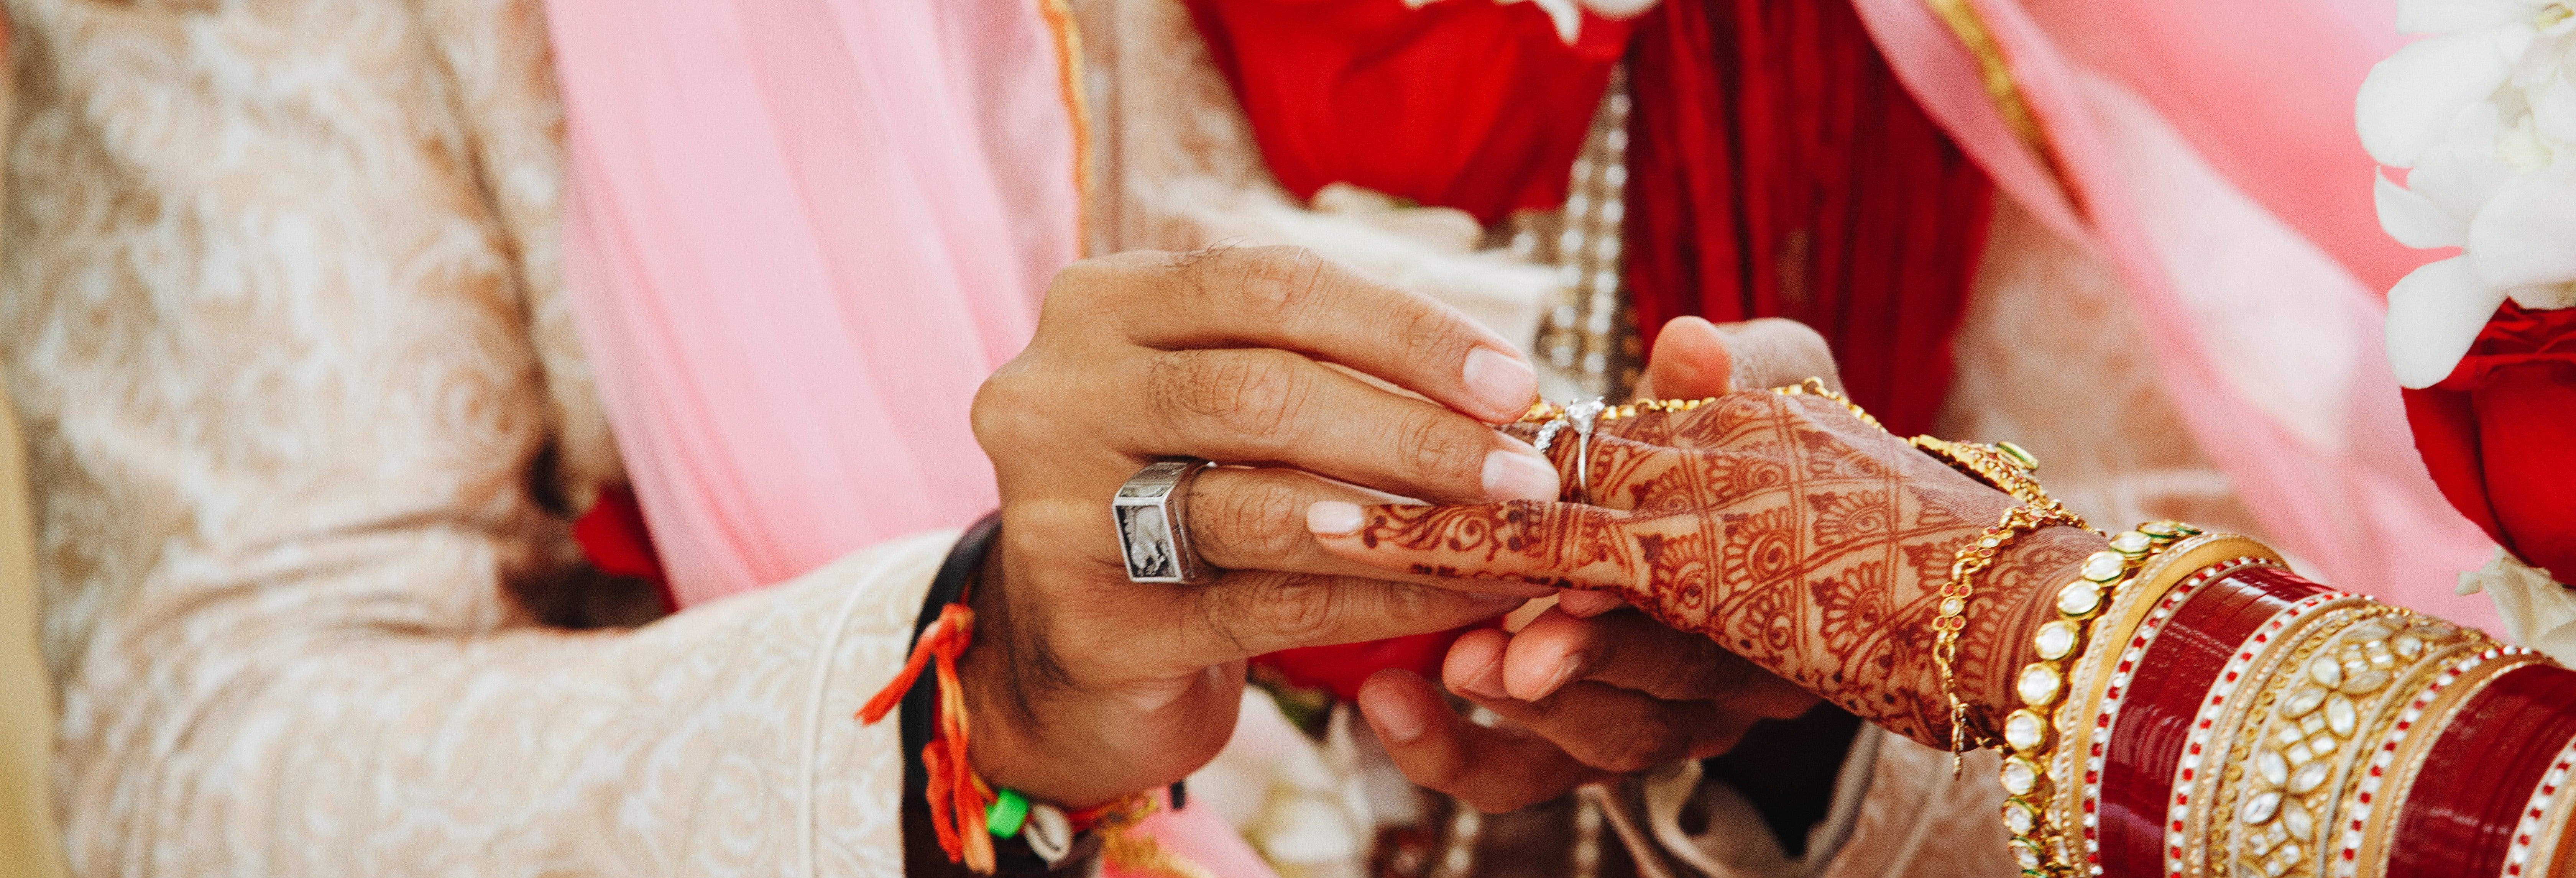 Boda hindú ¡Cásate con el rito tradicional!